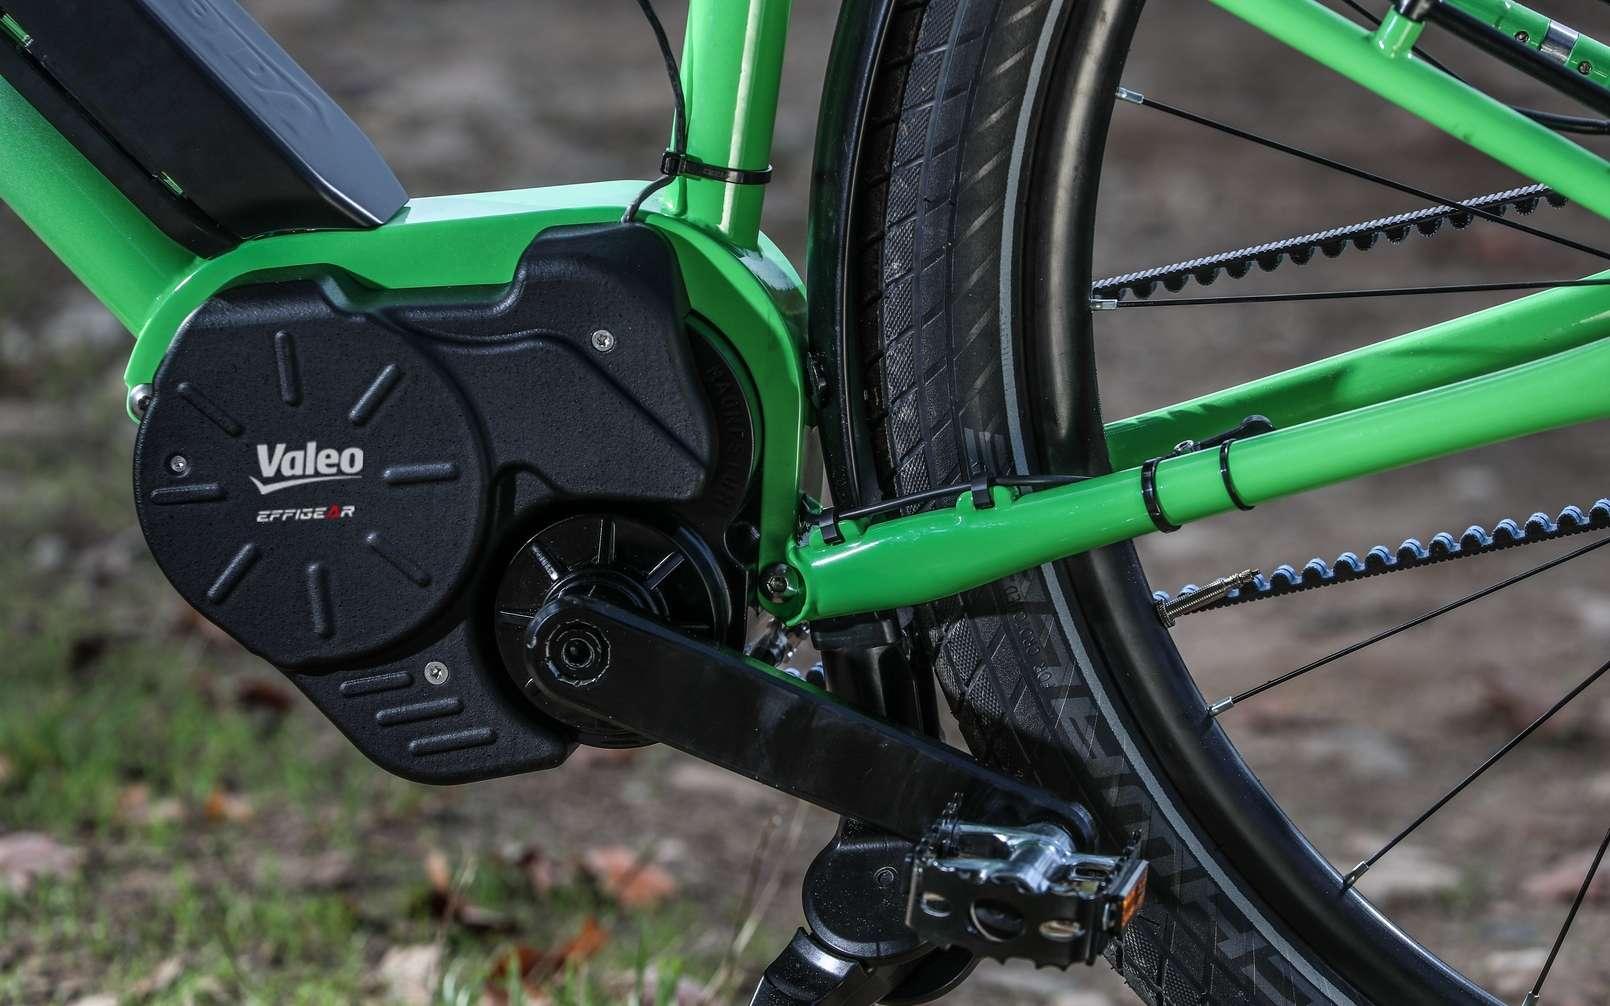 Valeo s'est associé au français Effigear qui a conçu la boite de vitesse automatique adaptative. © Valeo